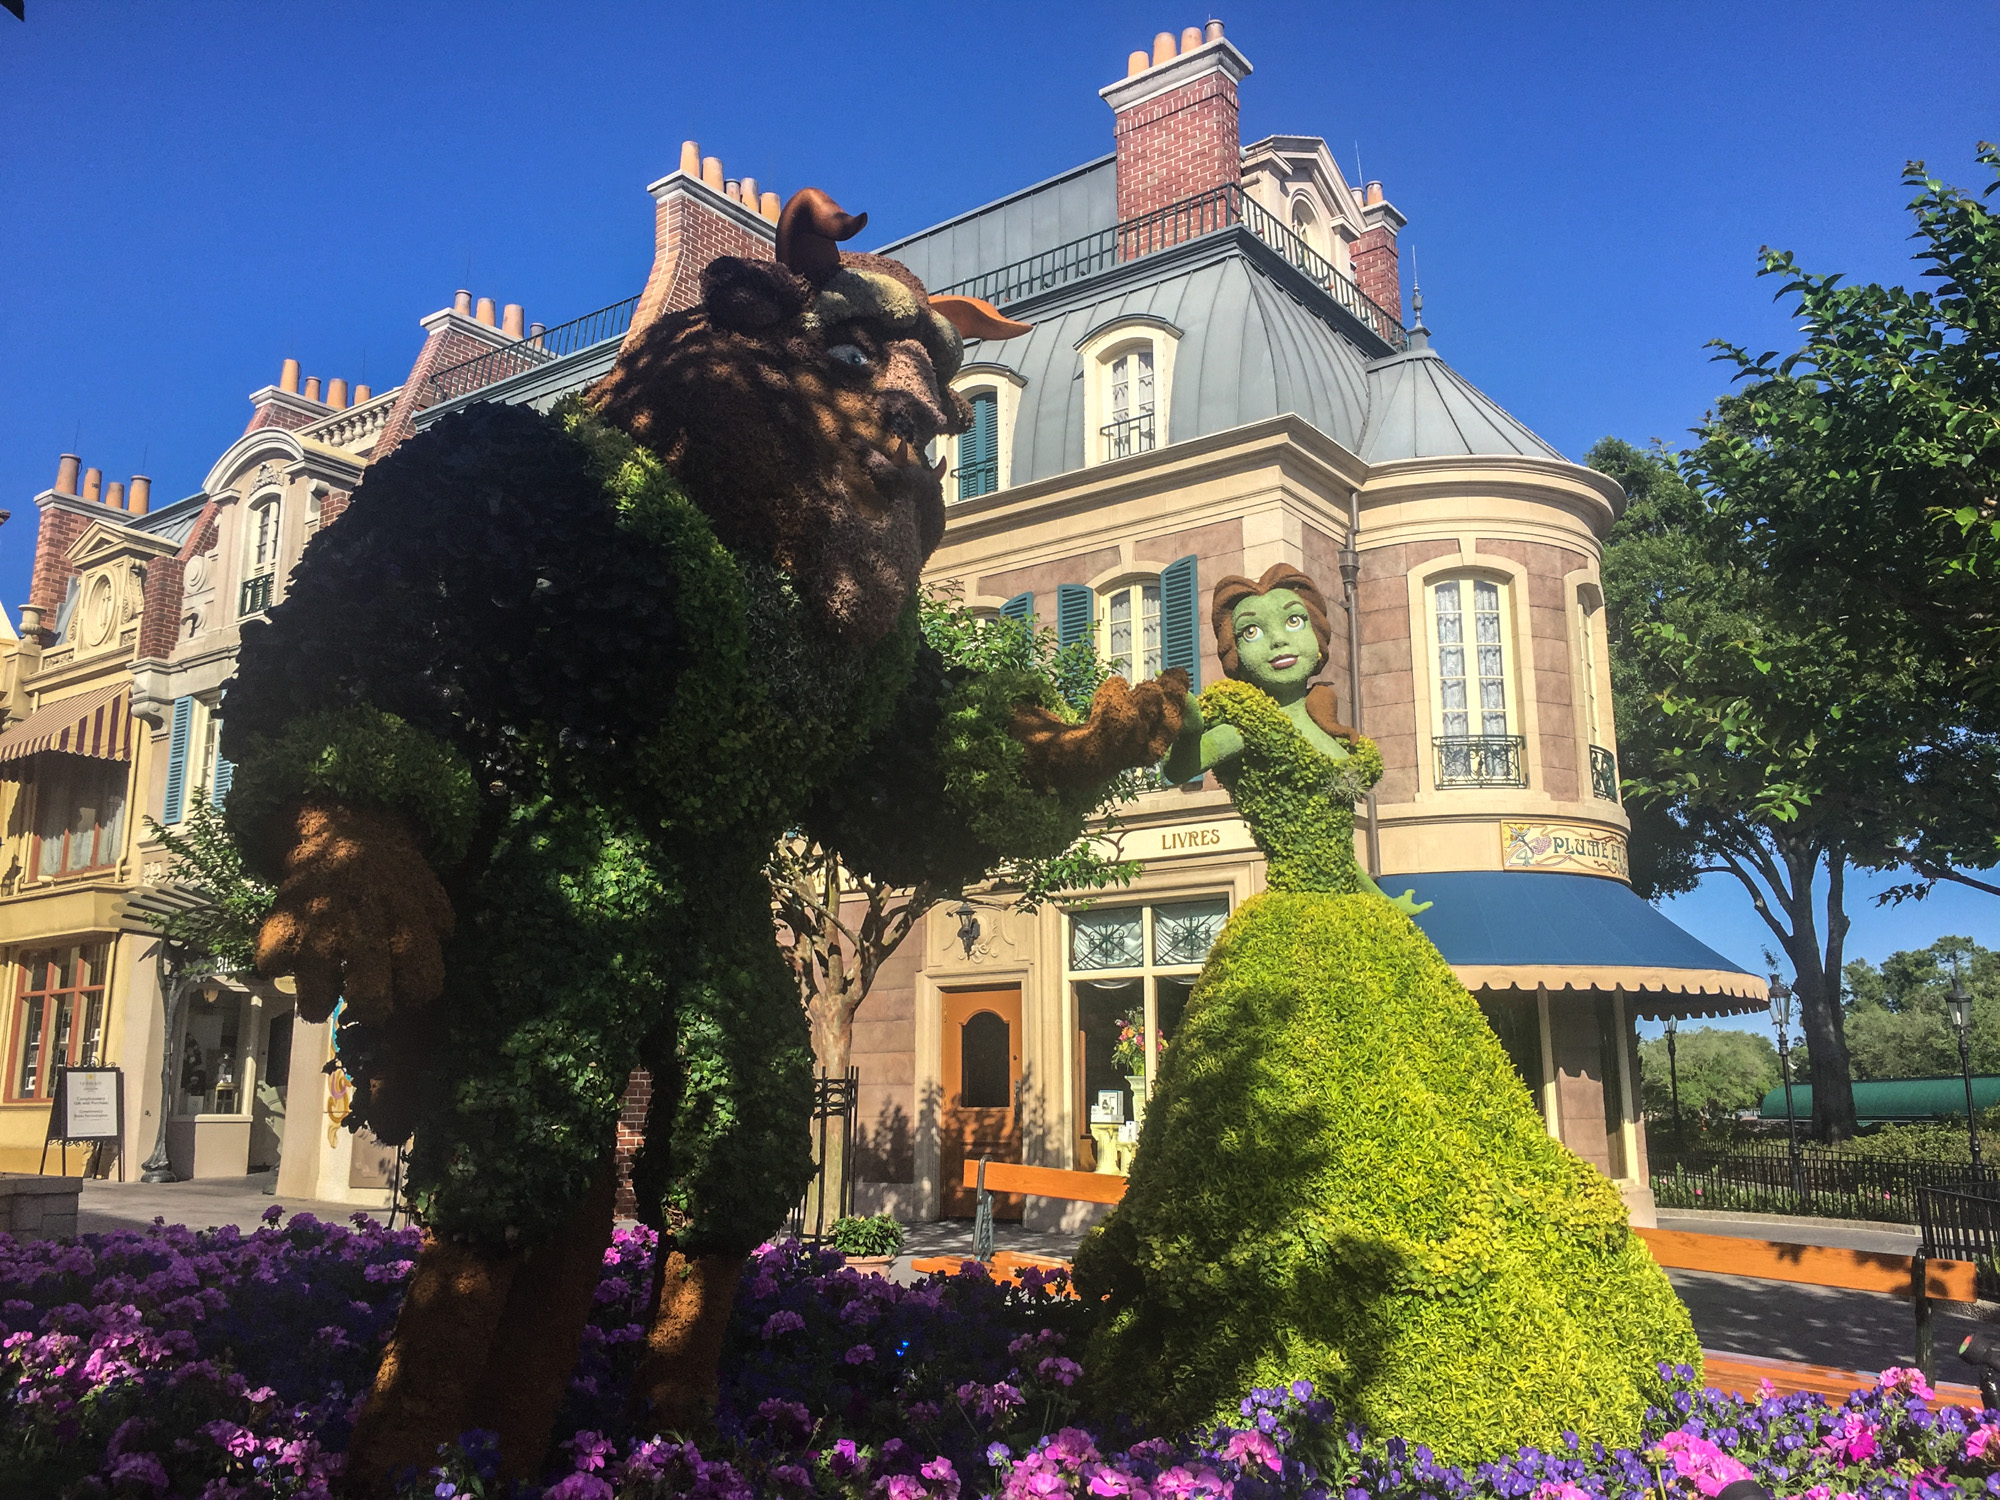 2017 Epcot International Flower And Garden Festival Tilly 39 S Nest